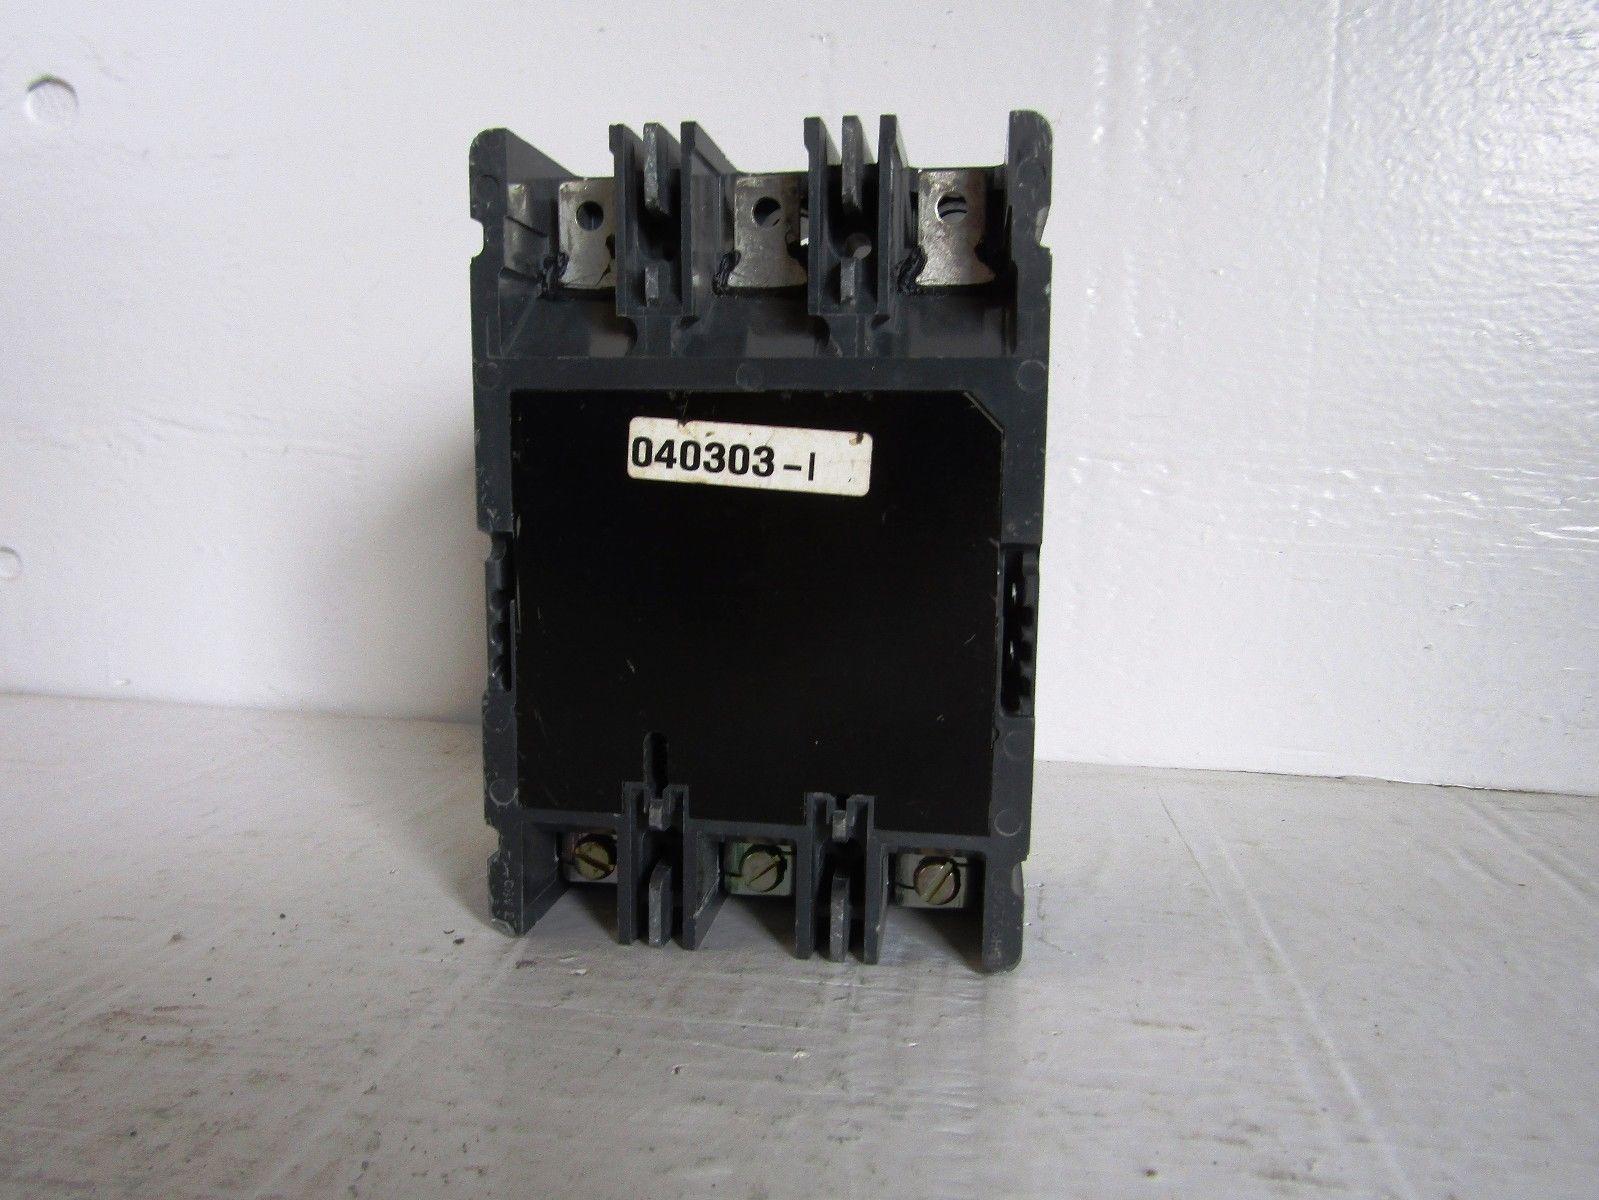 Emergency Lighting Ctu Wiring Diagram 37 Images Dual Lite Ballast Emergi Diagrams Cutler Hammer Hfd3045 600v 45a 3p Industrial Circuit Breaker 331884291374 5fit1599